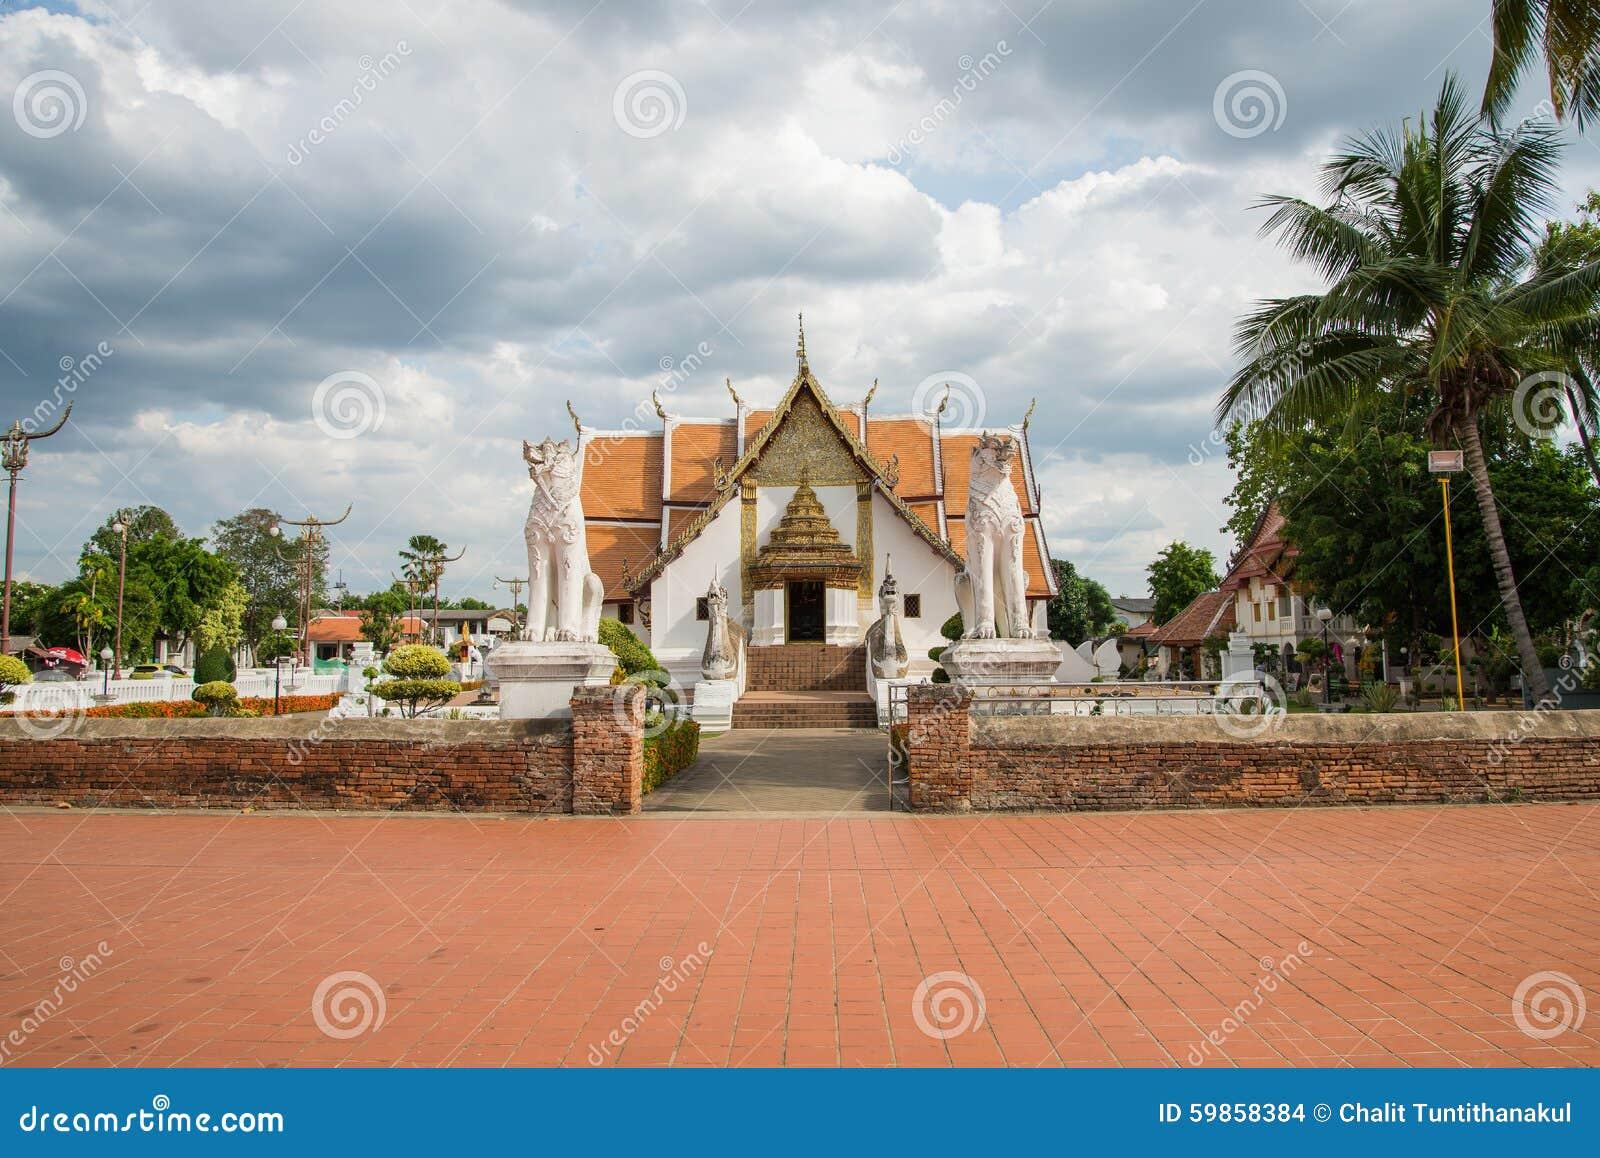 Tempel thailand